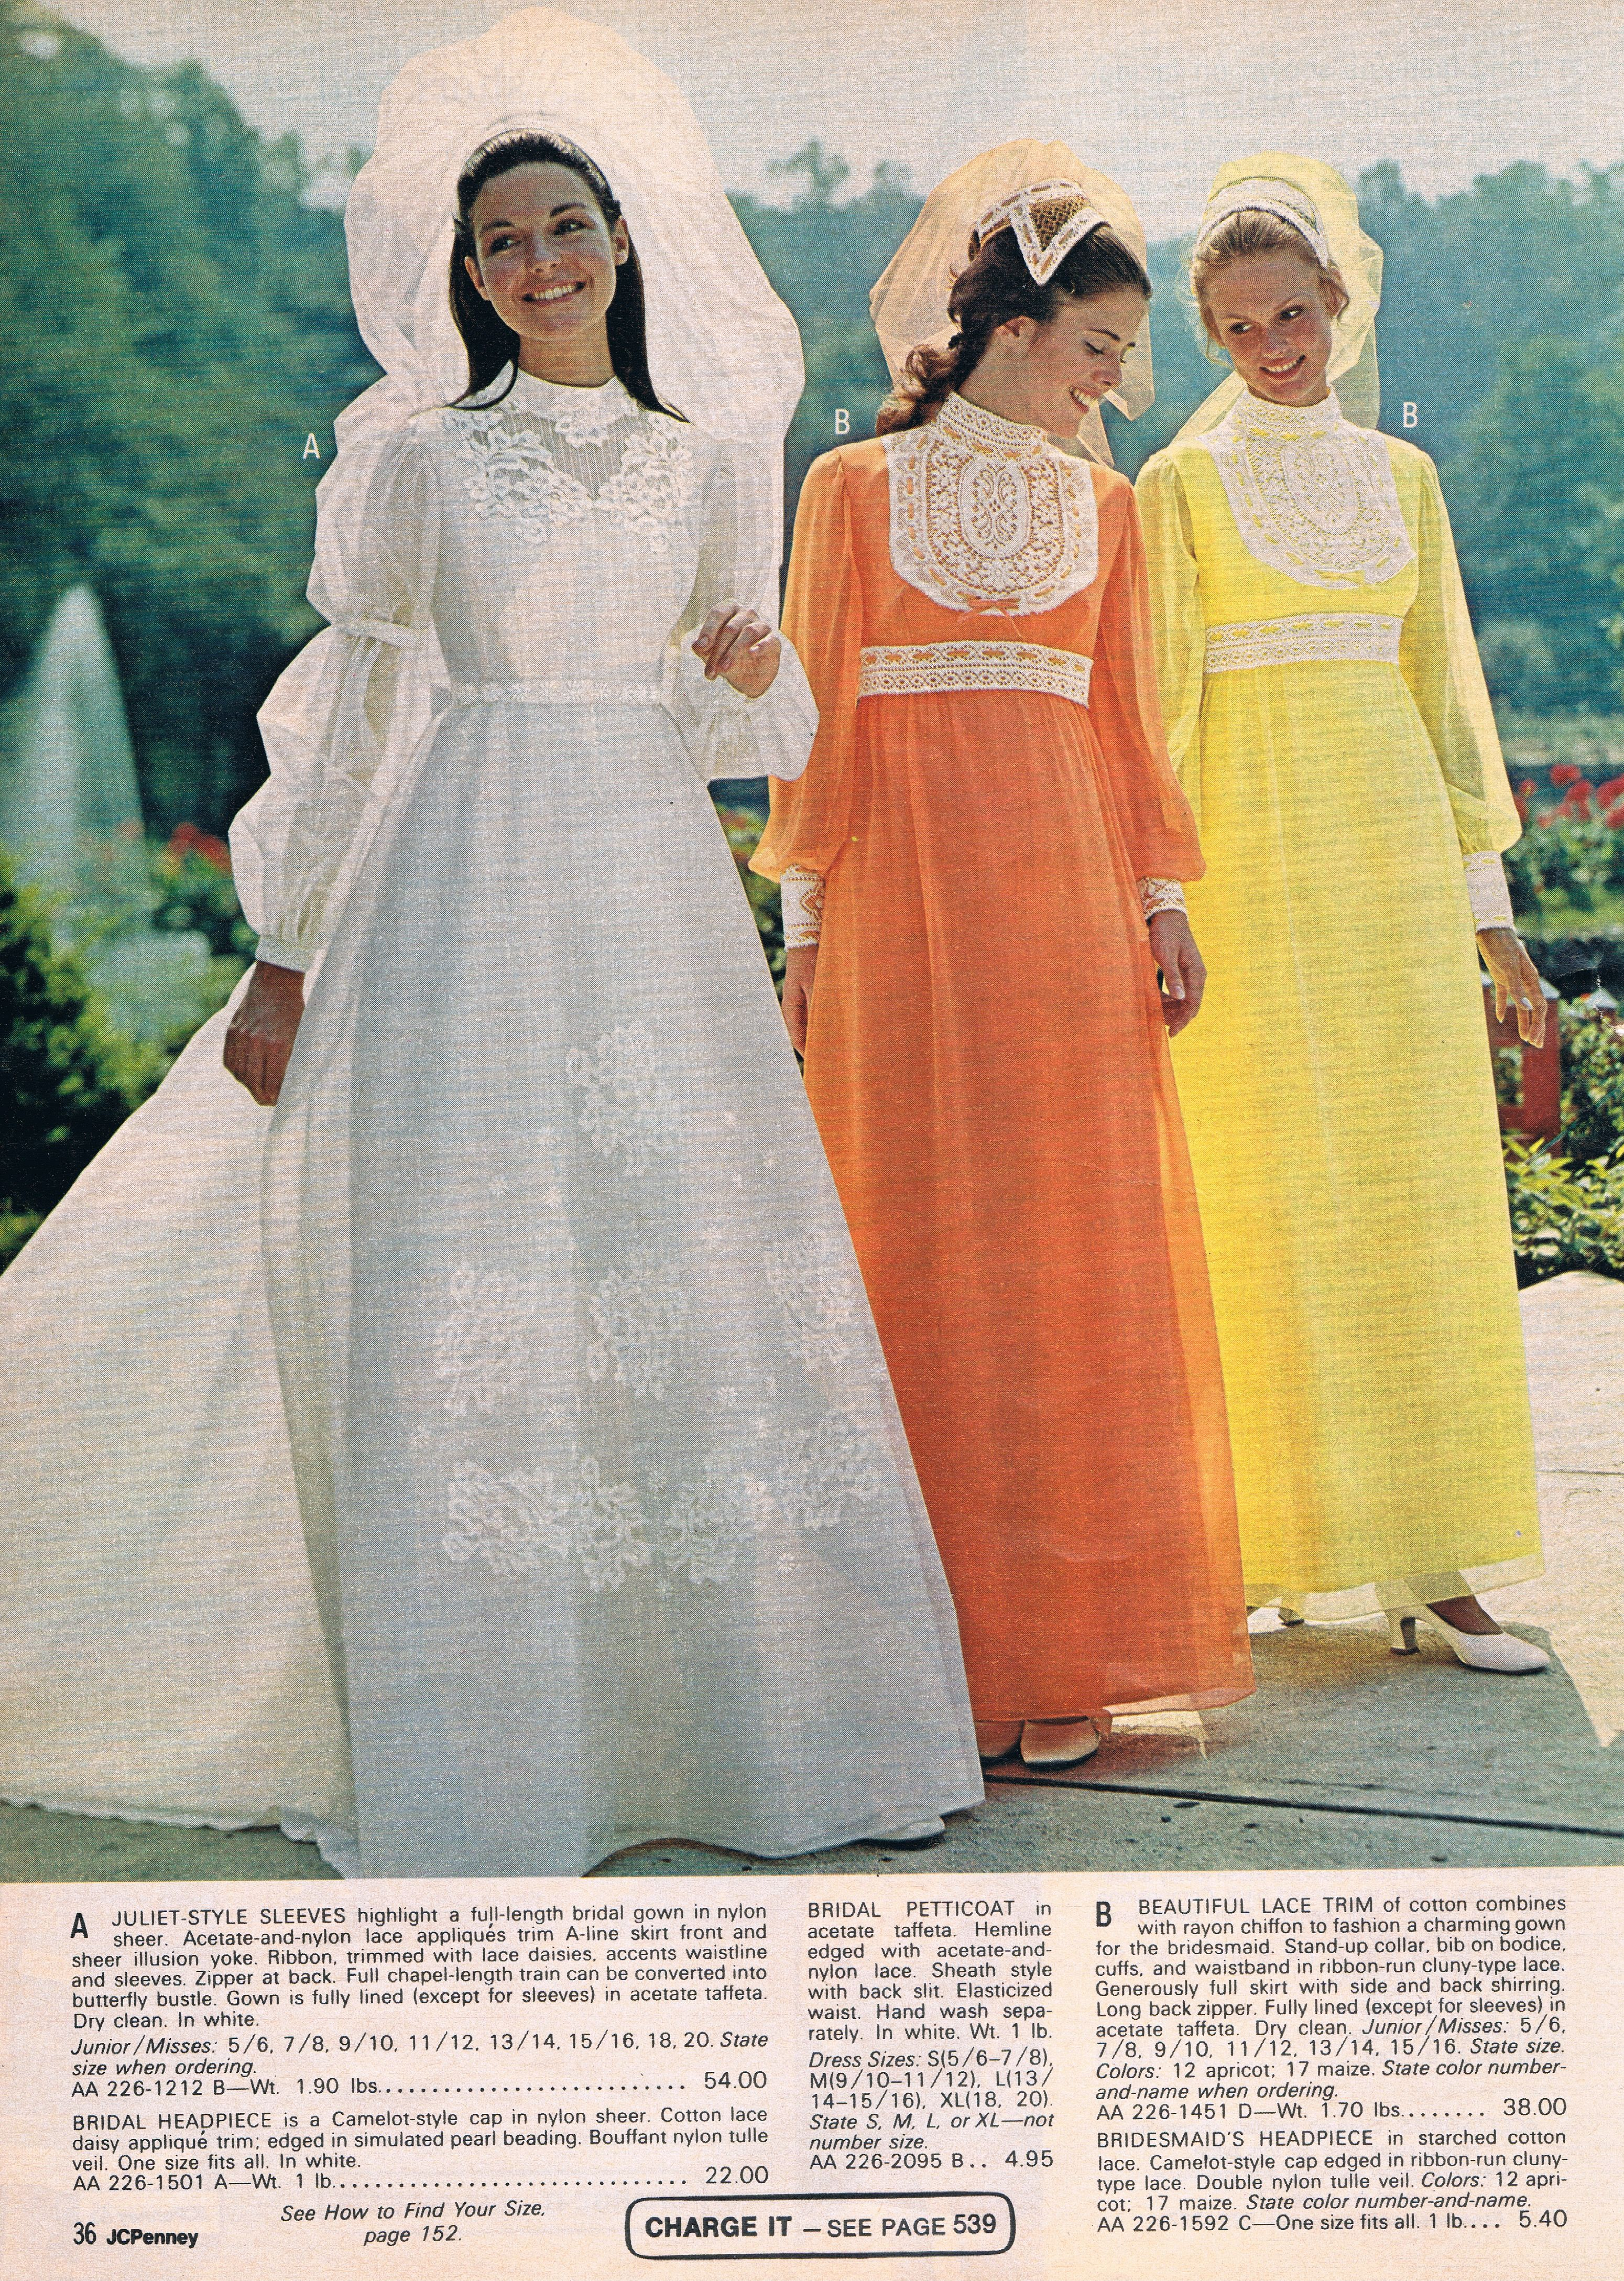 Penneys catalog 1972 vintage bridal and bridesmaid dresses 1960 penneys catalog 1972 vintage wedding gowns1970s weddingvintage bridalvintage ombrellifo Images